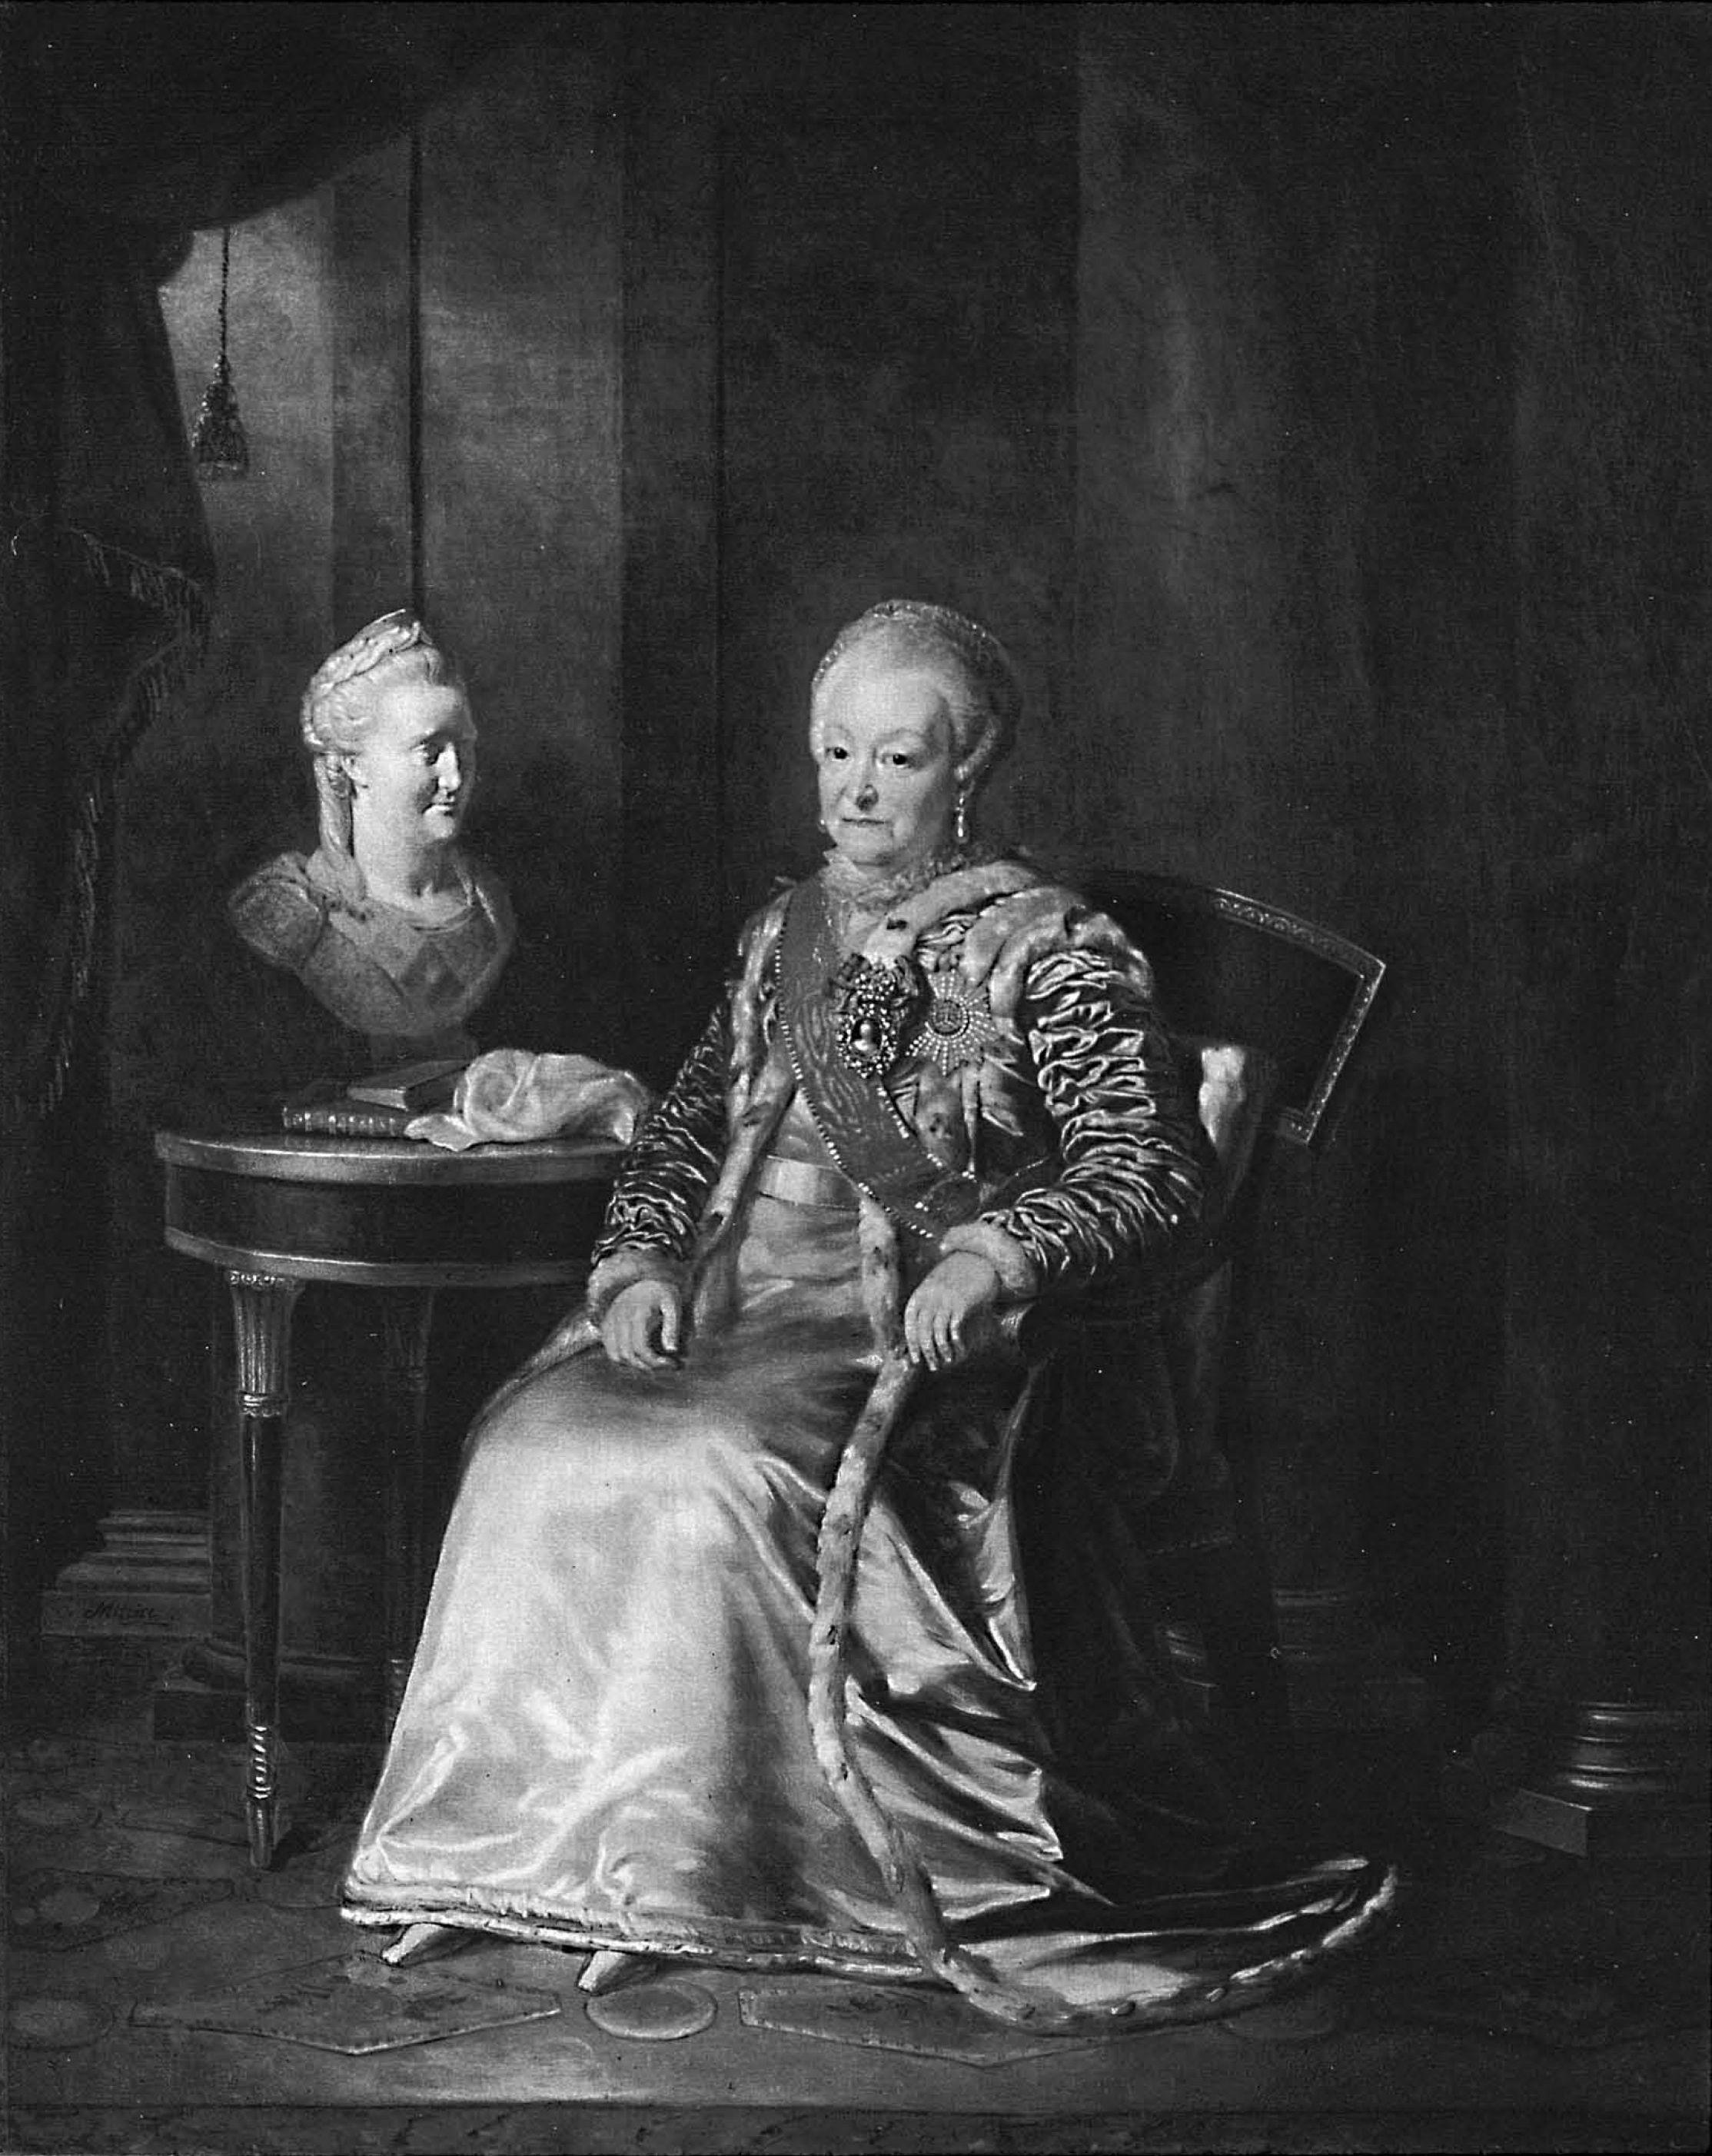 Файл:Marie Andreewna Roumiantzeff (1699-1788) - RusPortraits.jpg